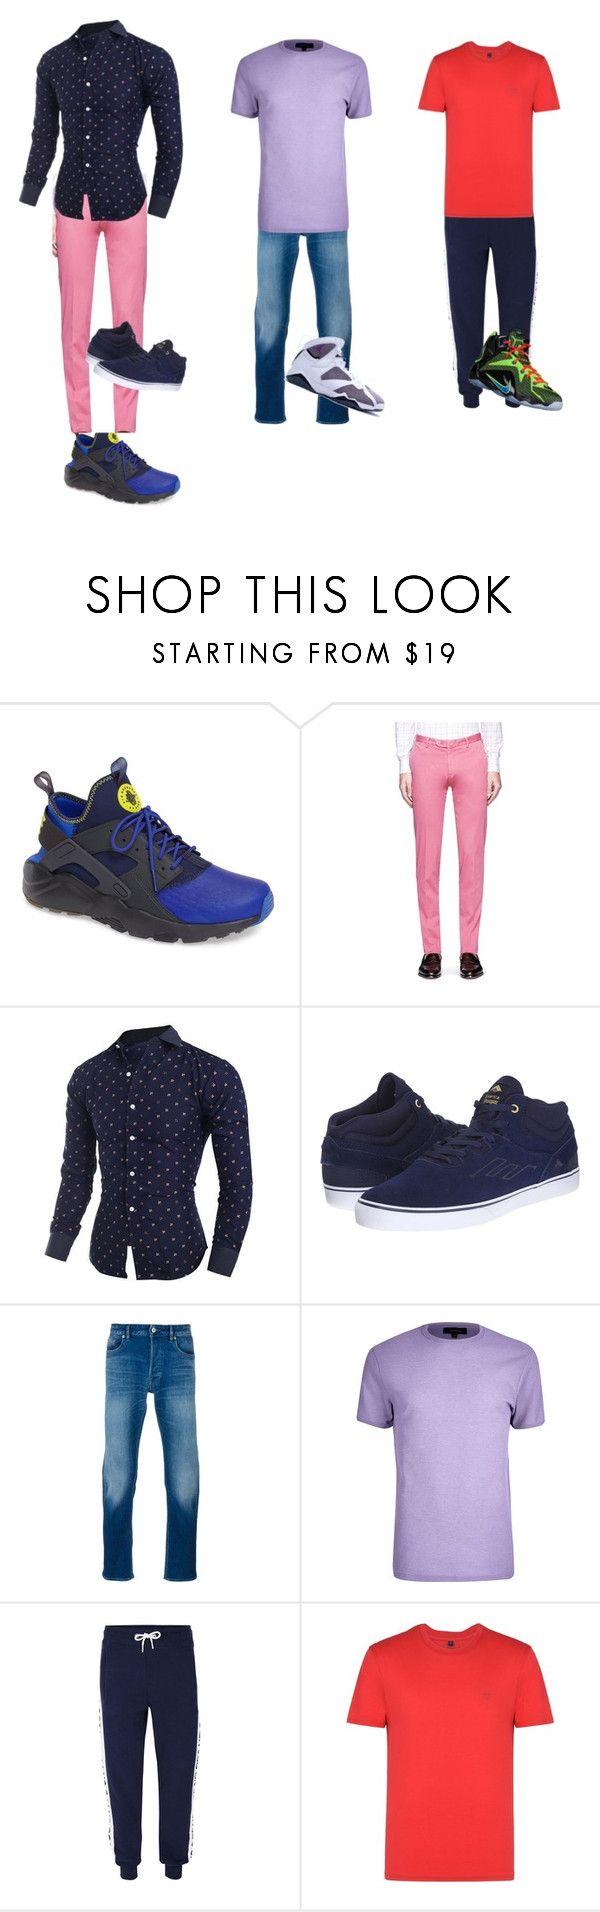 """blue denim red"" by briicreativity on Polyvore featuring NIKE, Isaia, Emerica, STONE ISLAND, River Island, Topman, Armani Jeans, men's fashion and menswear"